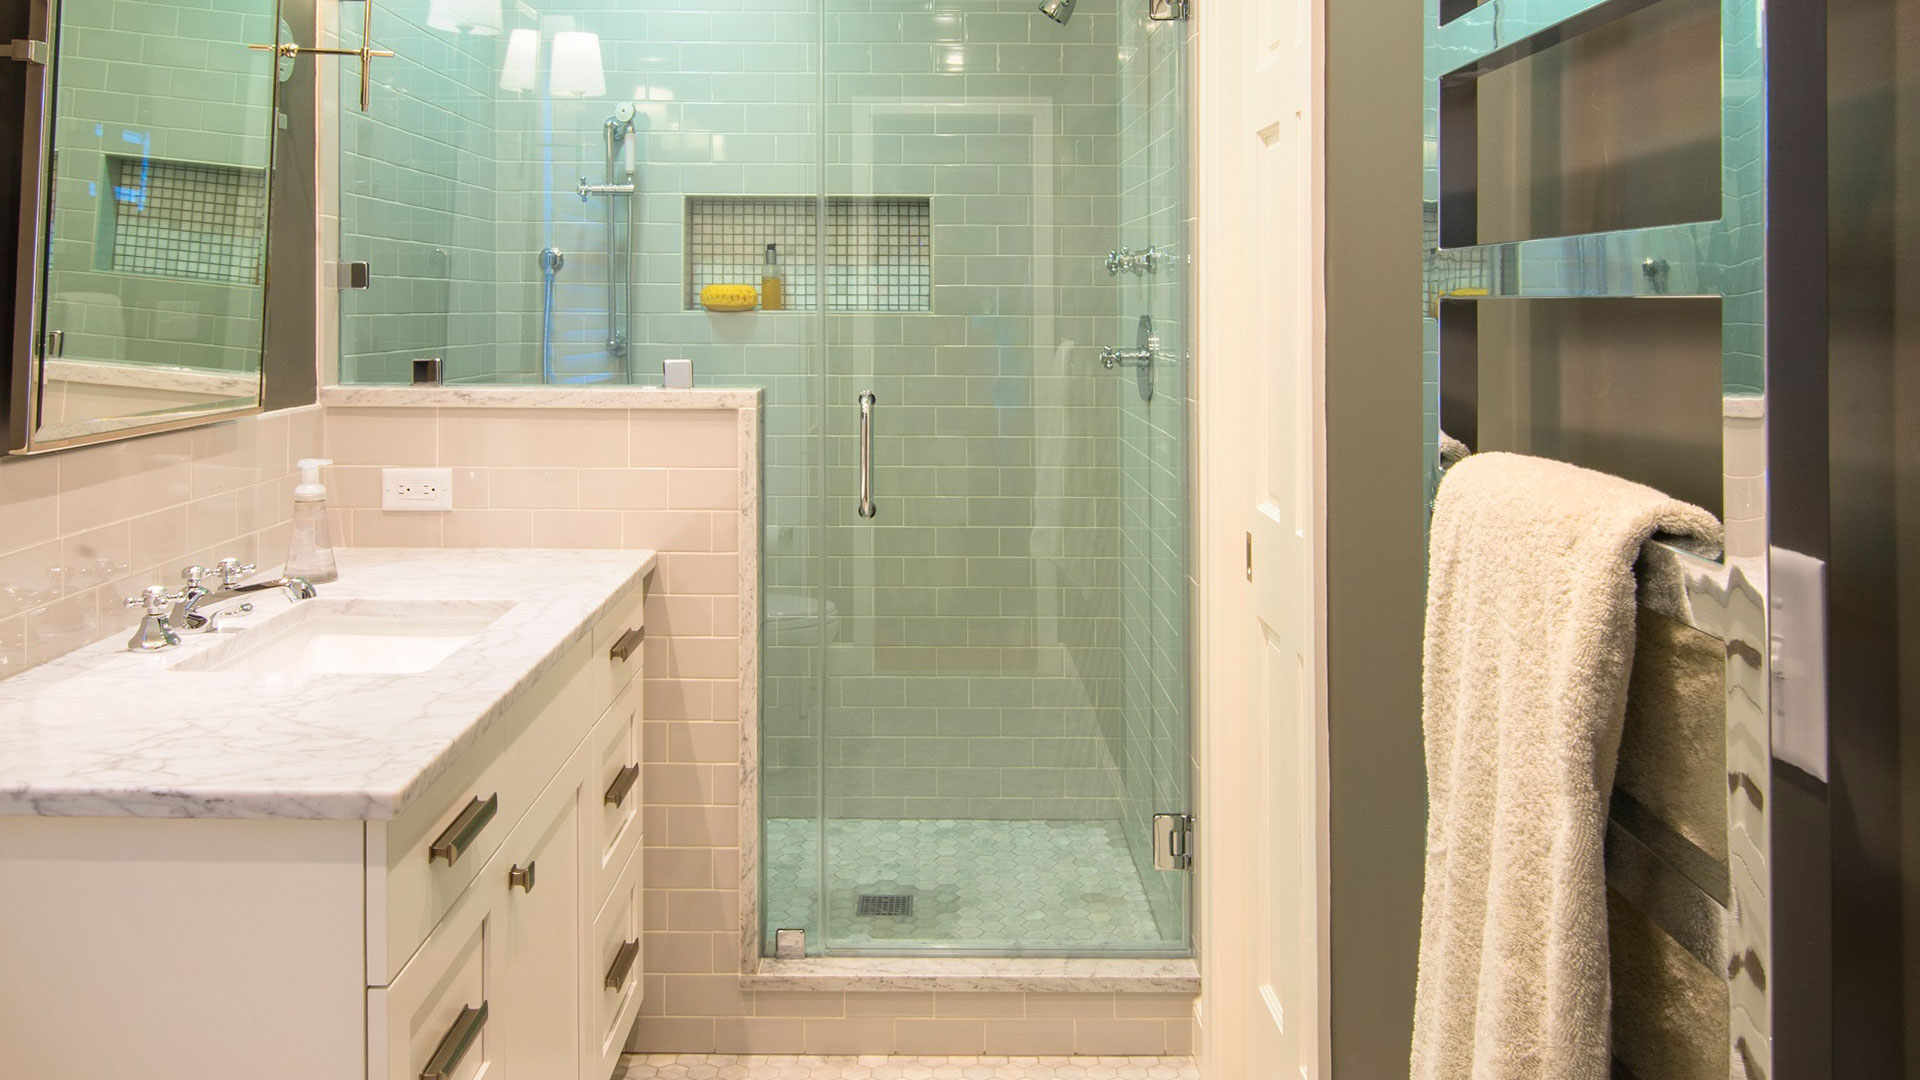 9 Ways to Make a Small Bathroom Feel Bigger